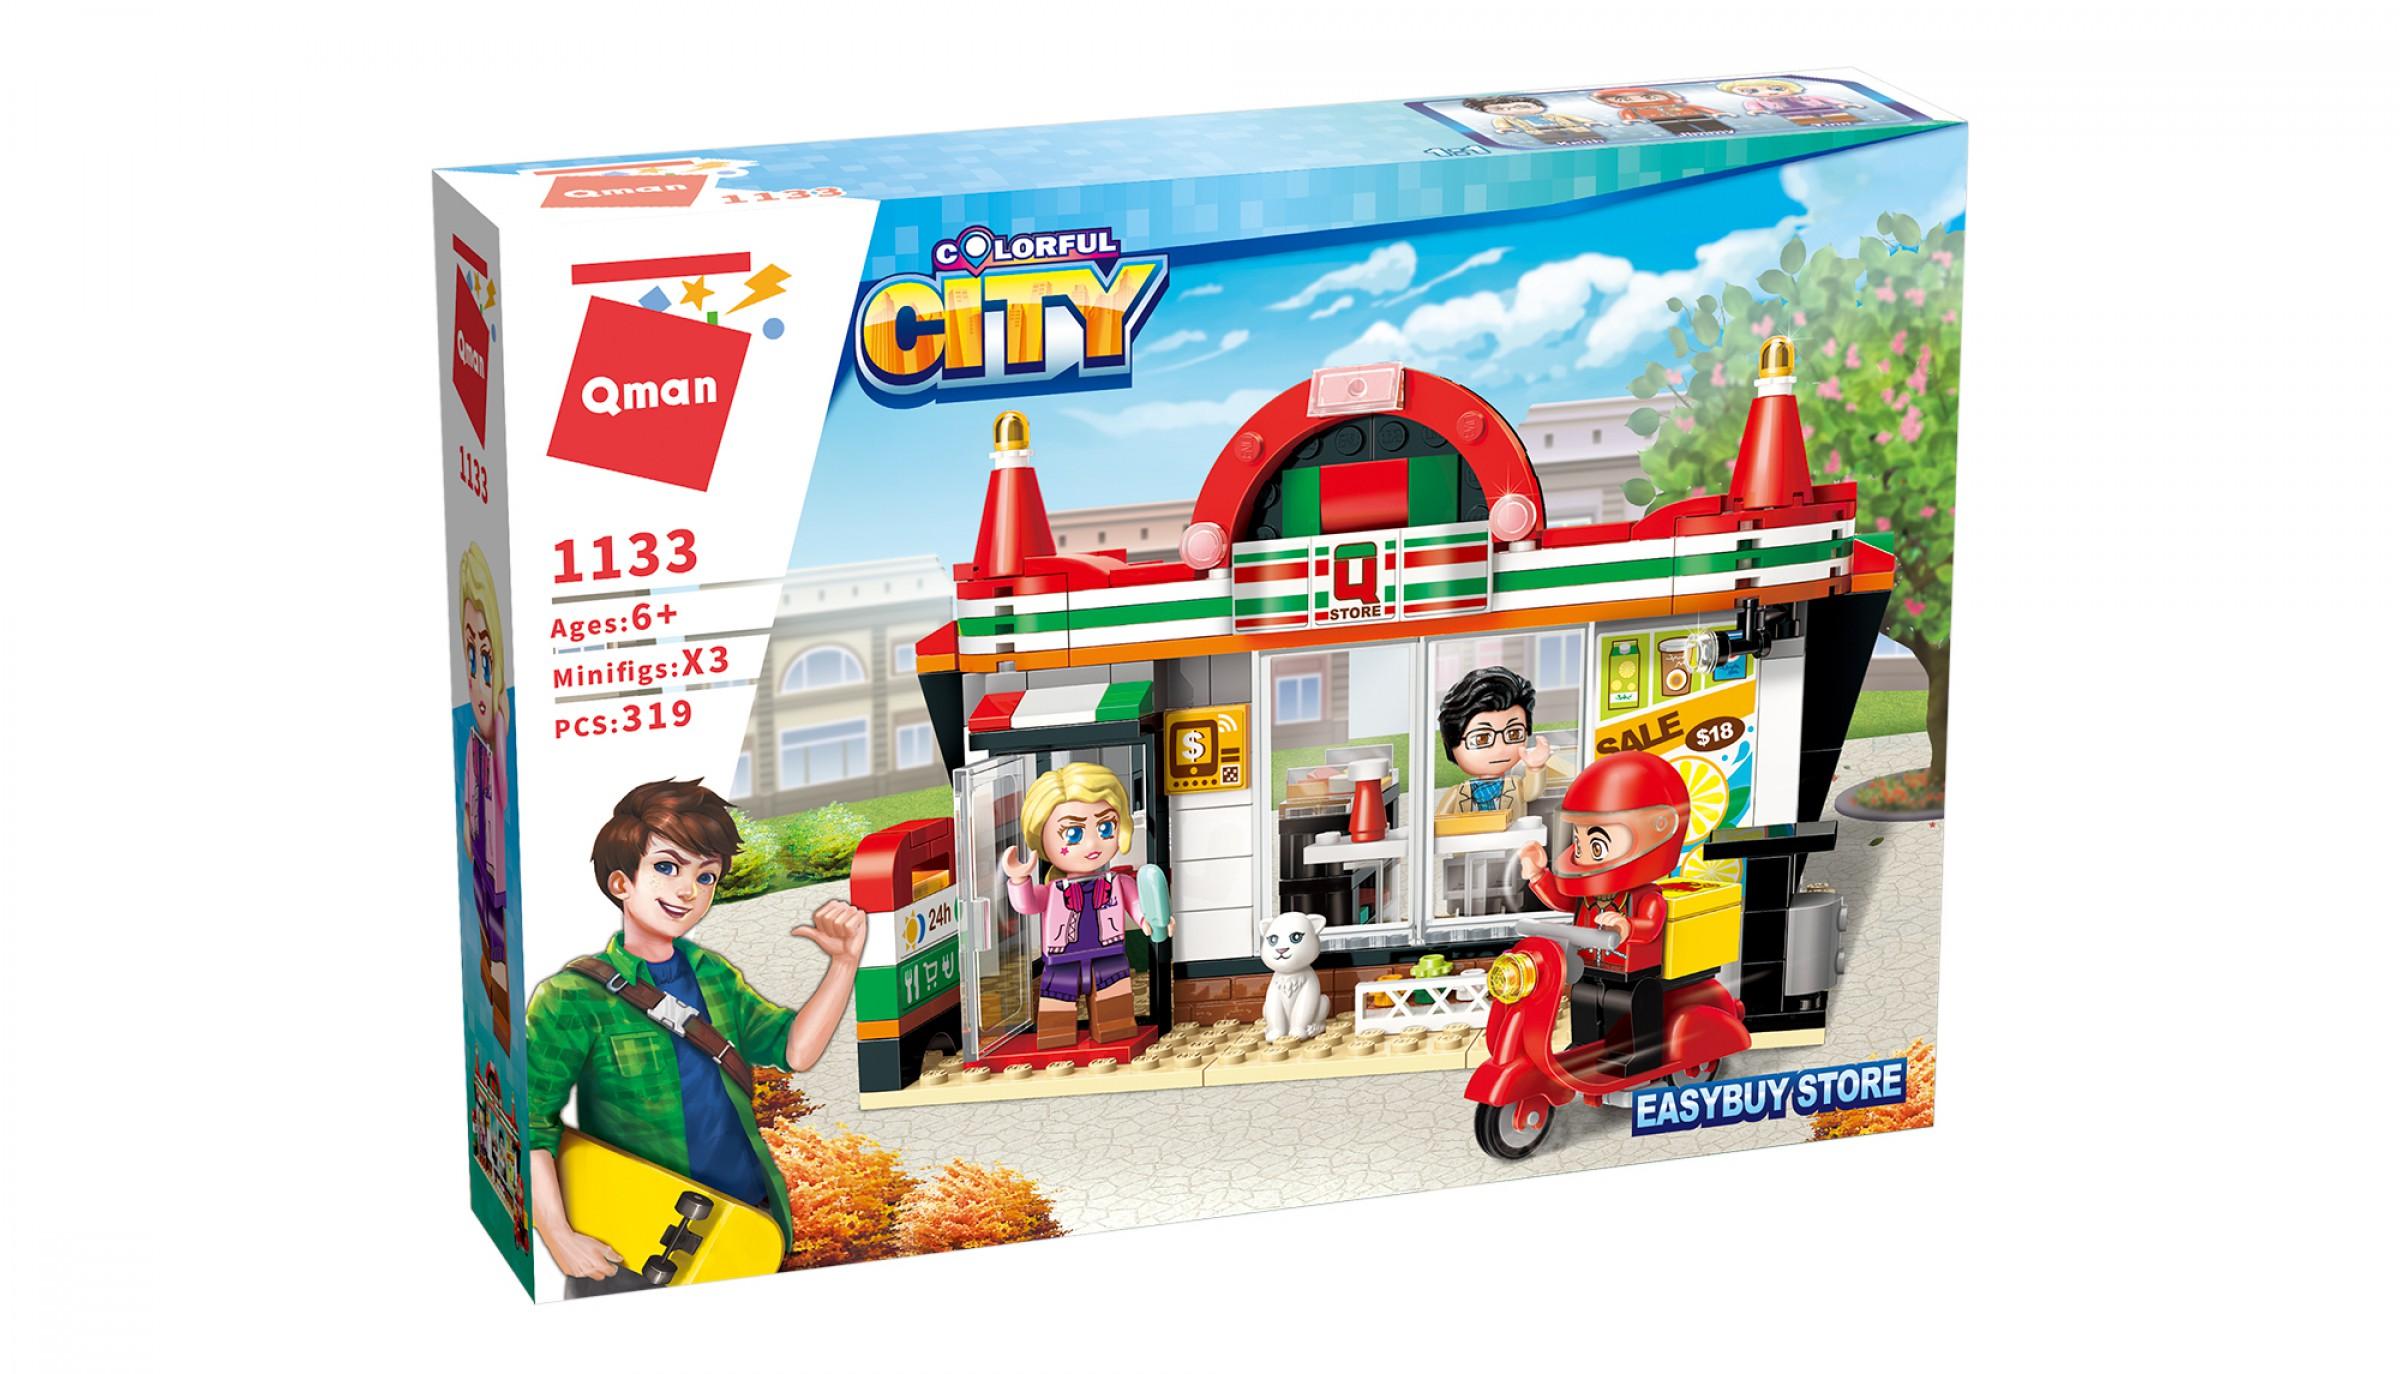 Qman Colorful City 1133 Koloniál